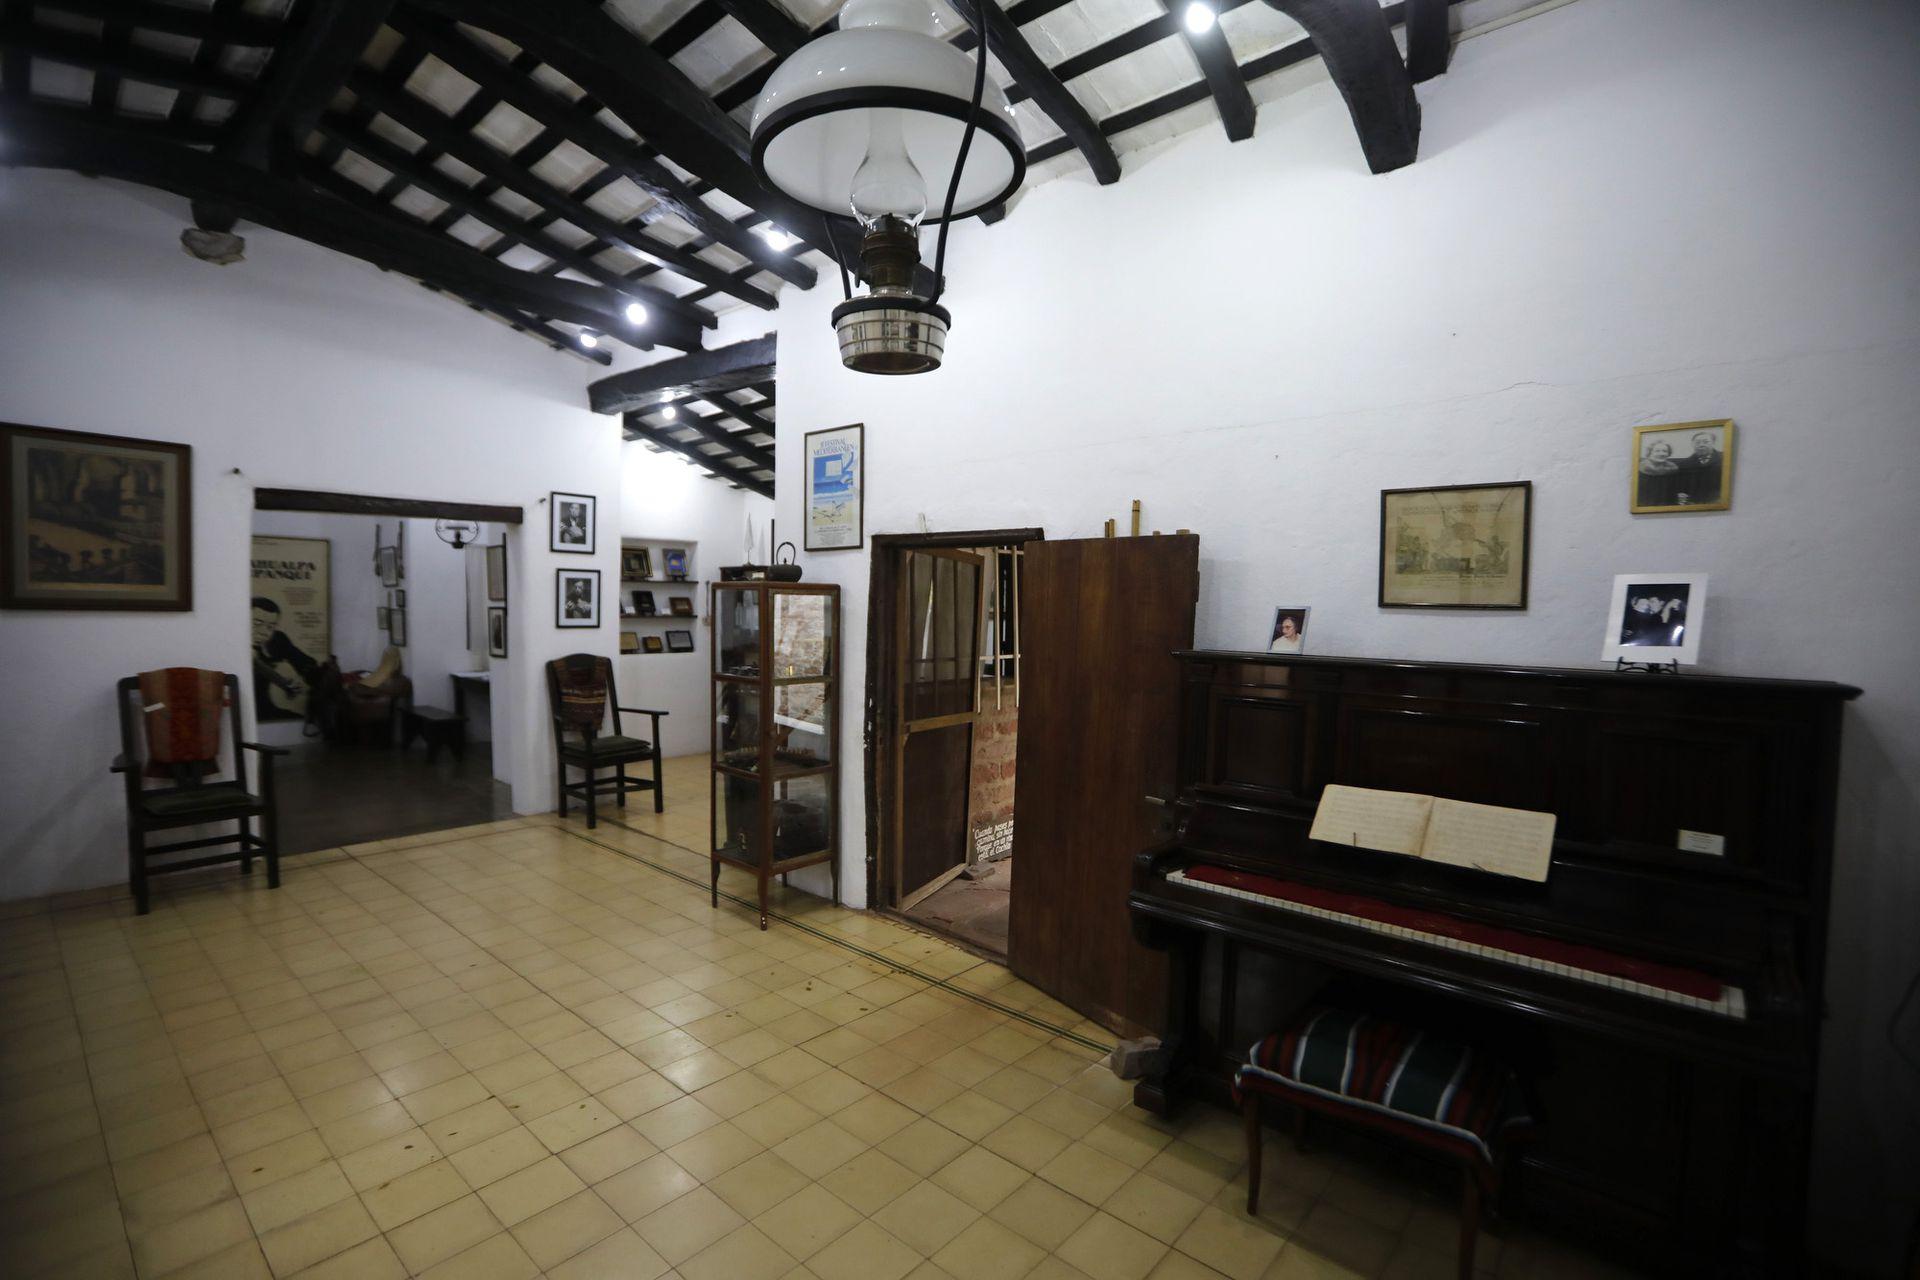 Interior de la Casa museo de Atahualpa Yupanqui en Cerro Colorado, Córdoba